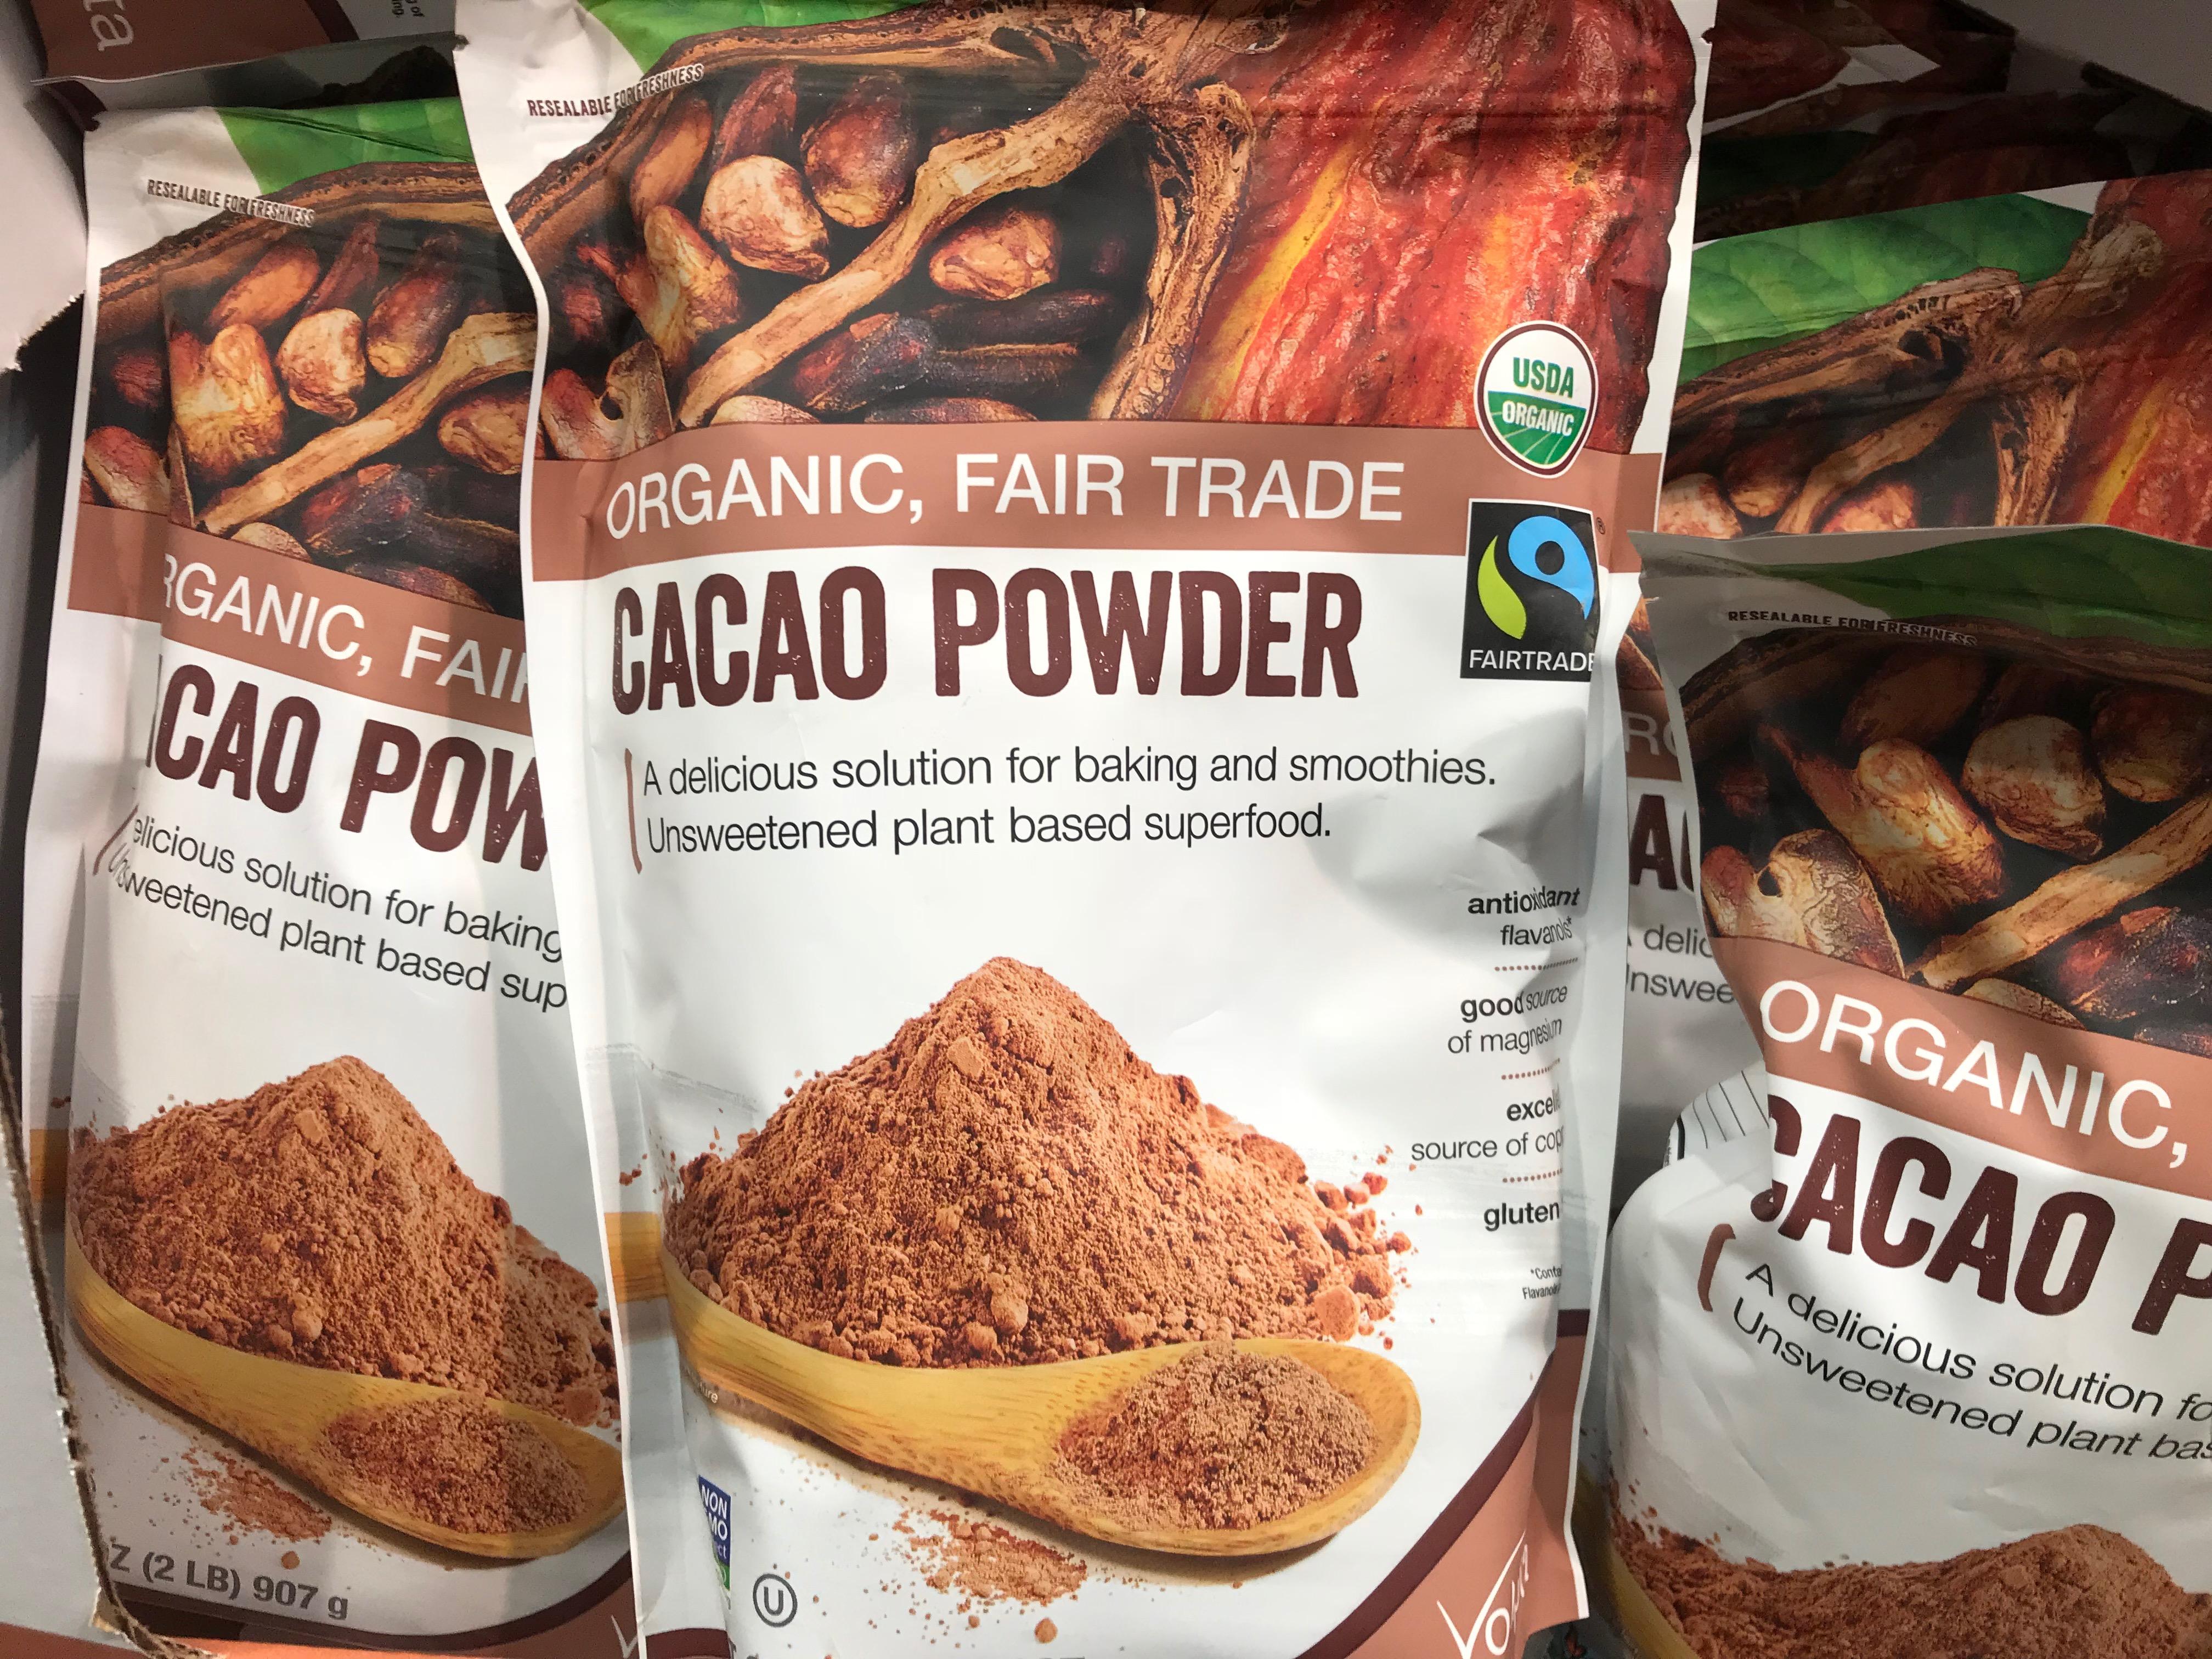 Volupta Organic Cacao Powder Harvey Costco